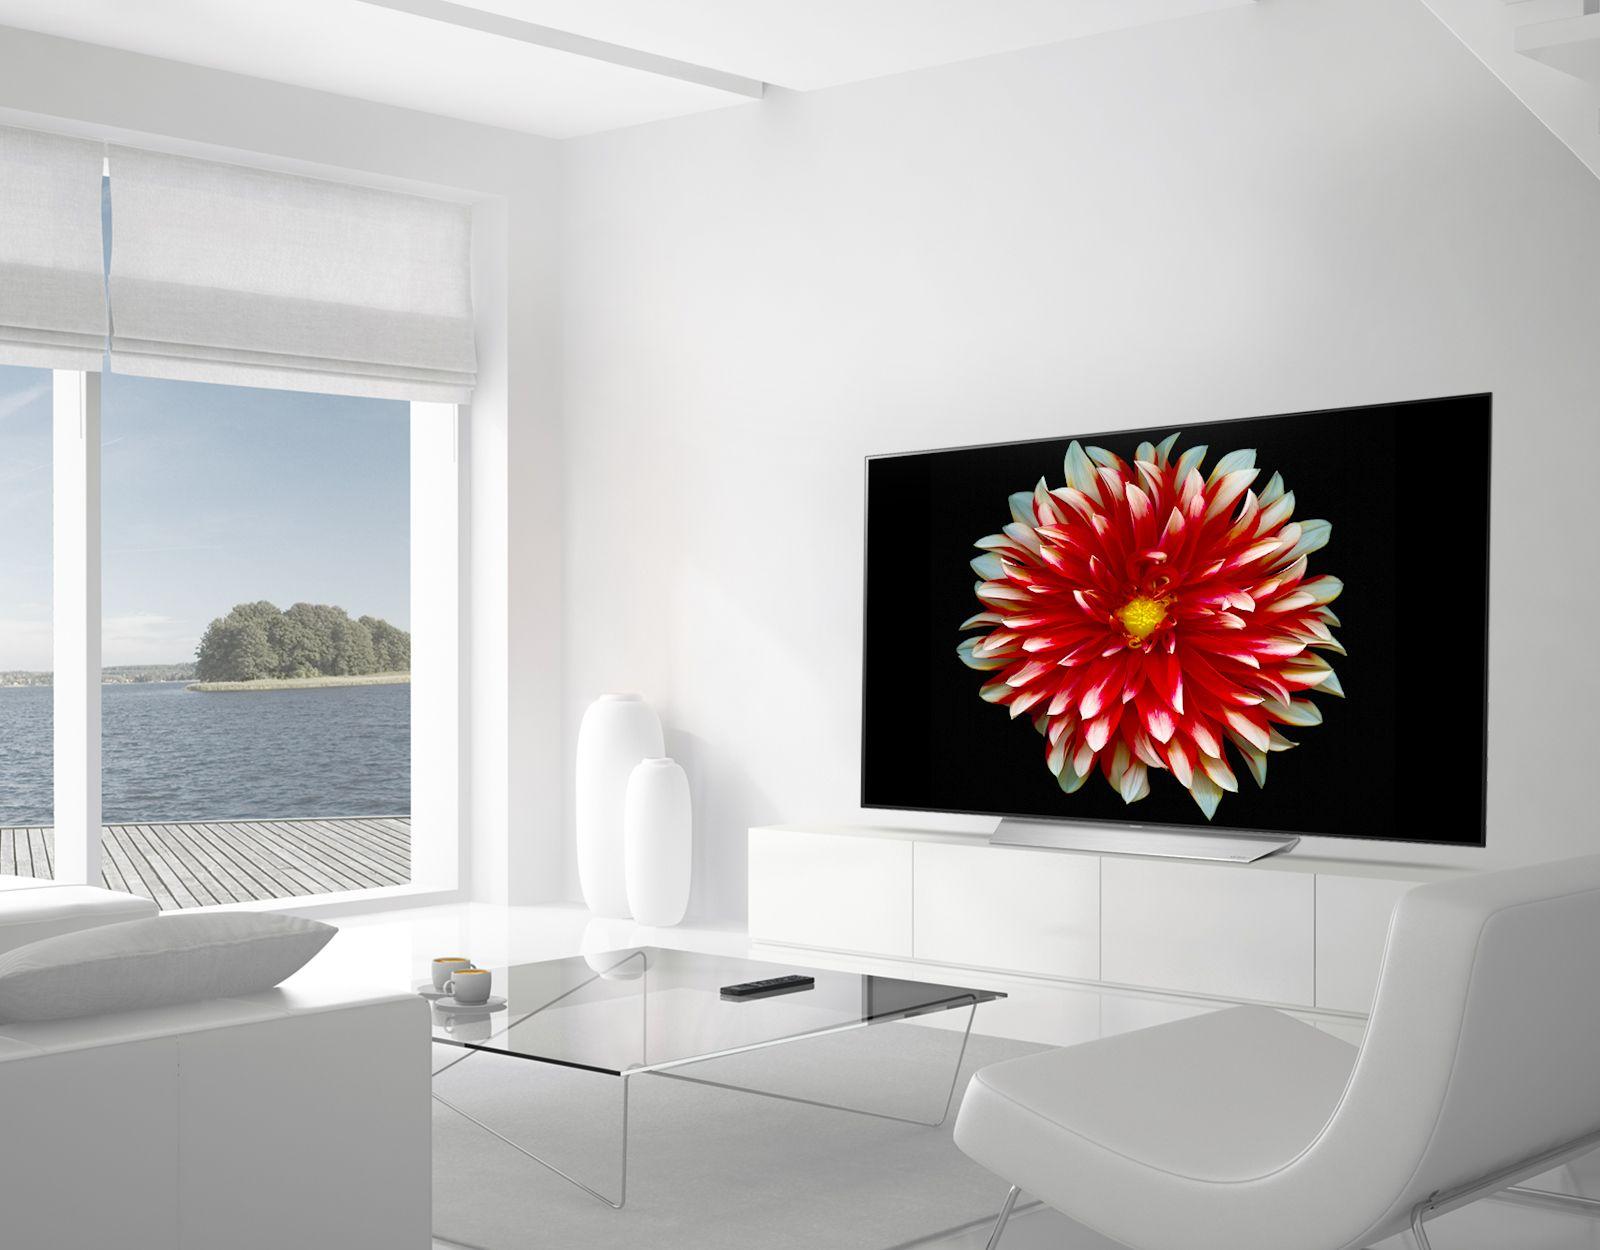 C7 OLED 4K HDR Smart TV 55'' Class (54.6'' Diag) Smart